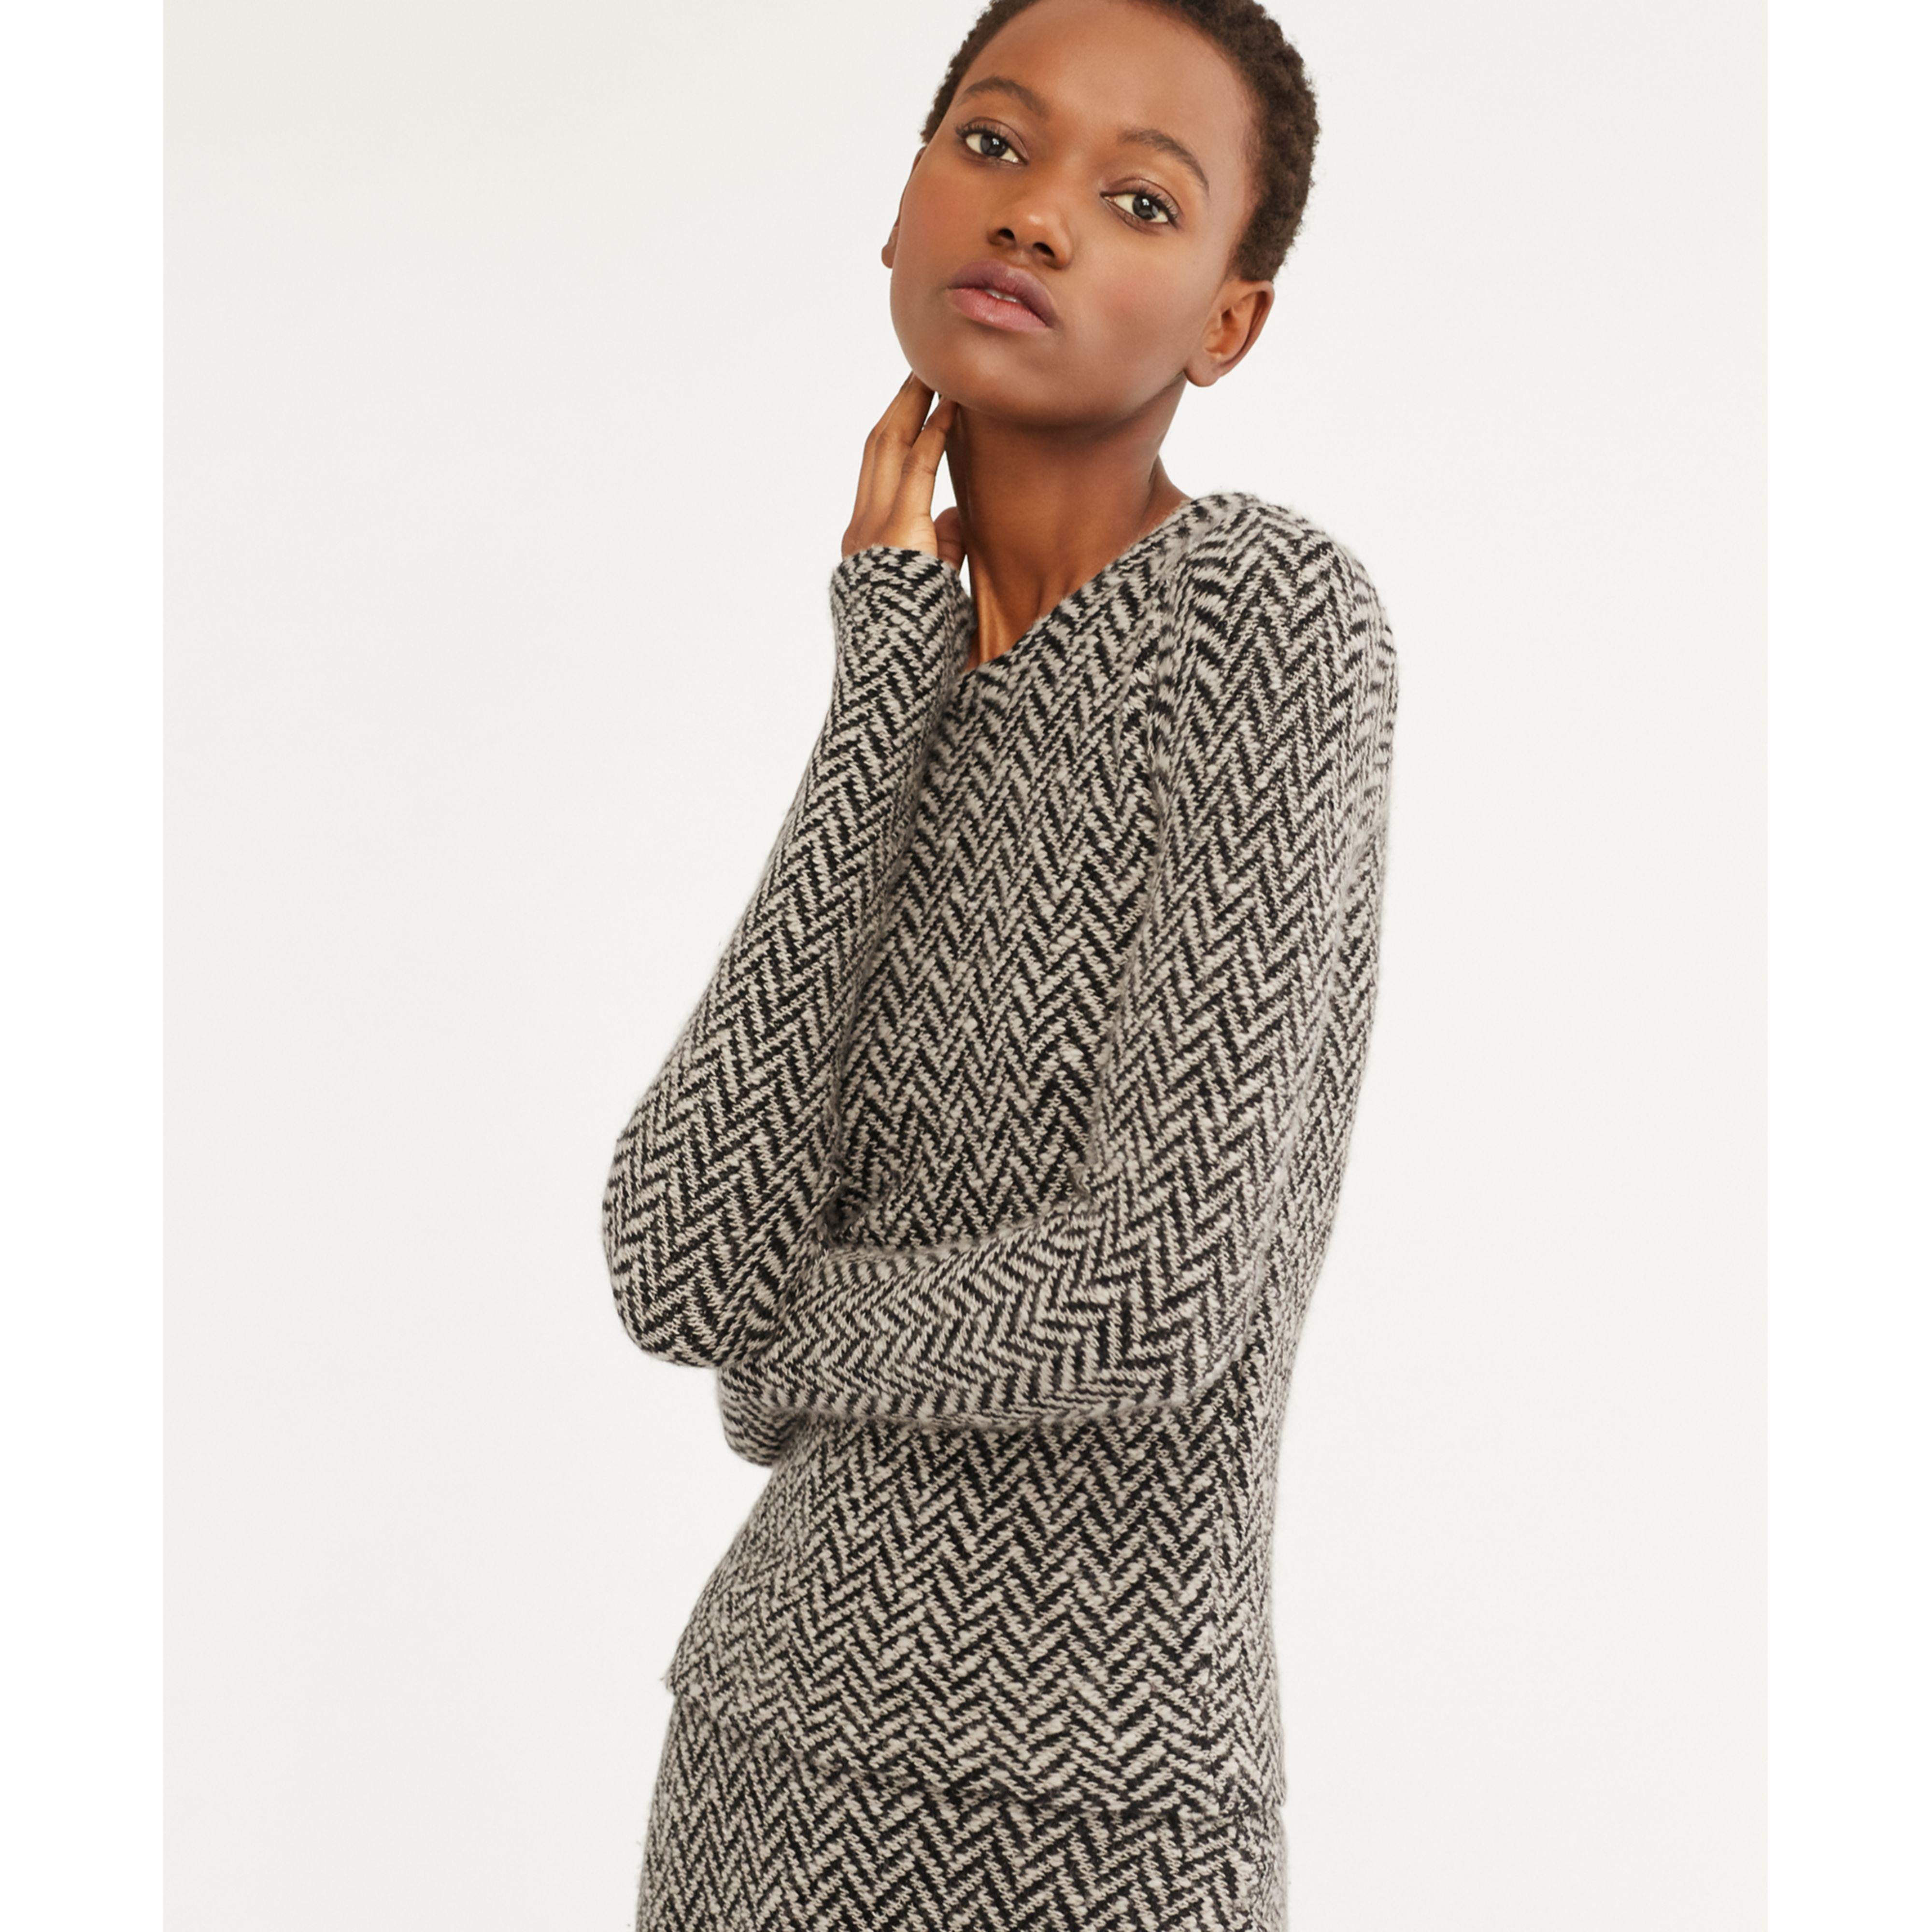 Hooded Herringbone Cardigan Sweater | Tulips Clothing